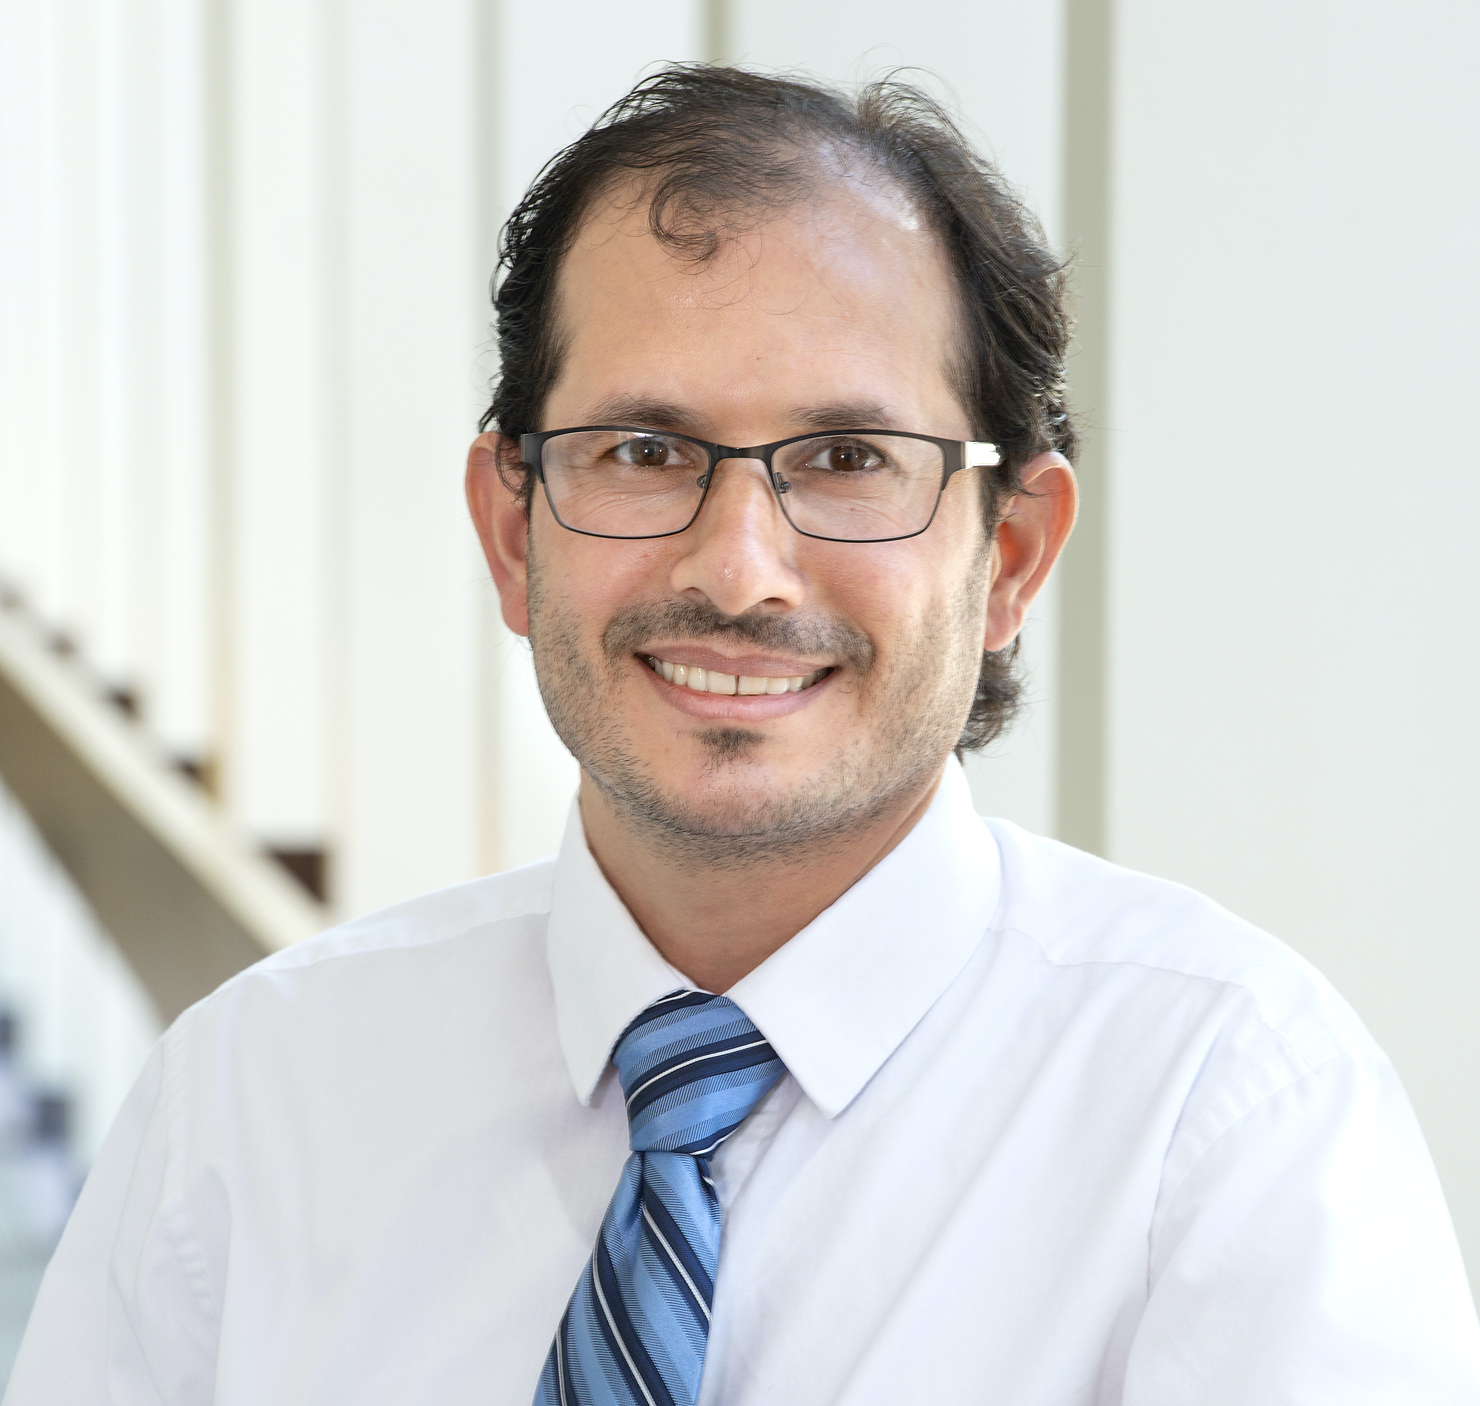 PMR resident Dr. Mahmood Alatbee